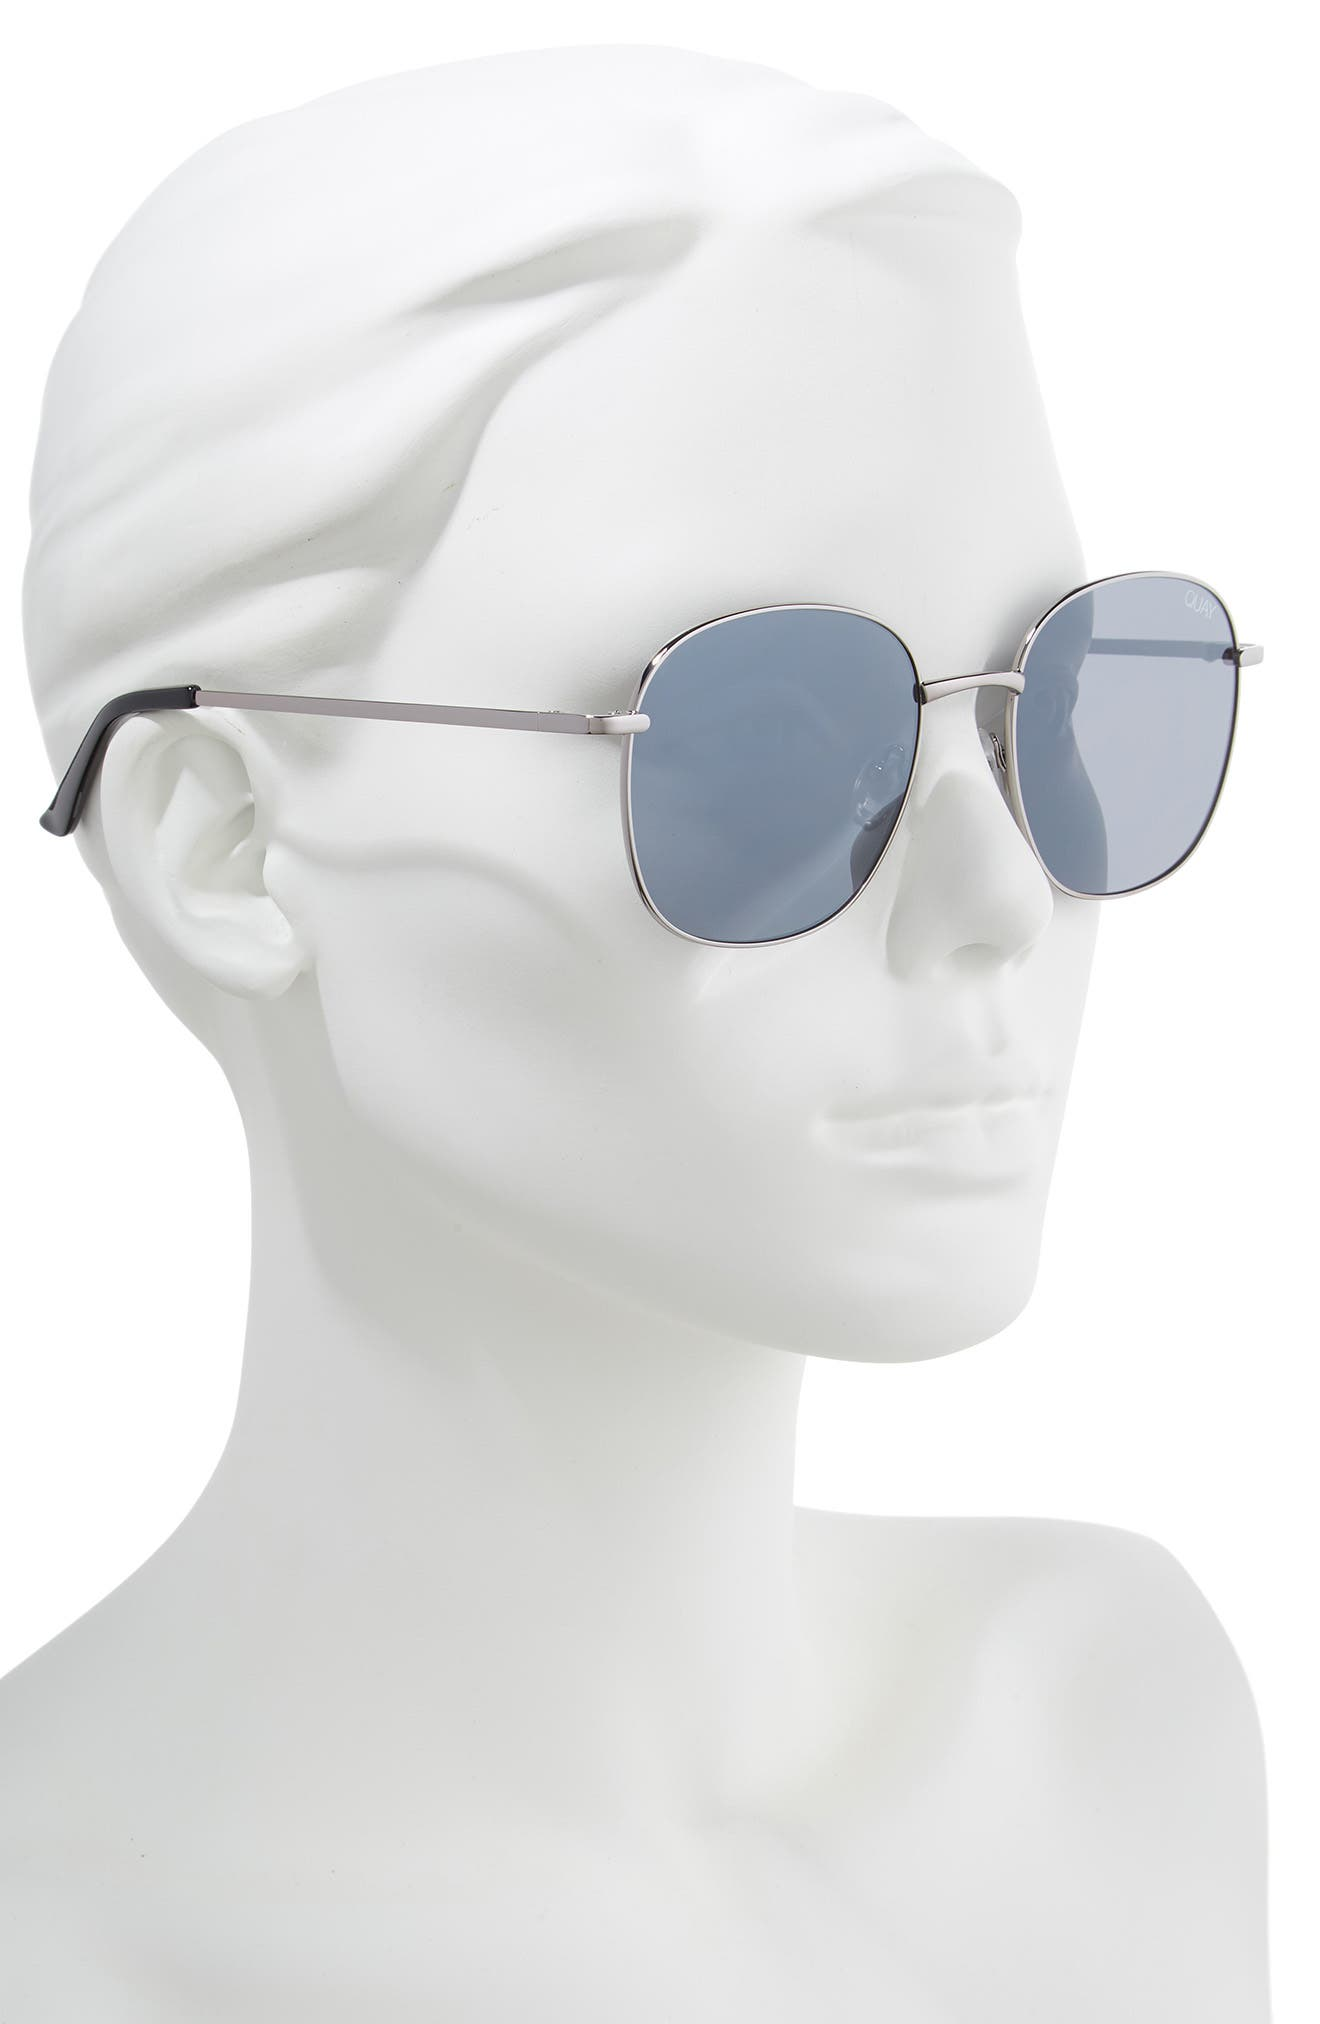 QUAY AUSTRALIA, Jezabell 57mm Round Sunglasses, Alternate thumbnail 2, color, GUNMETAL / SILVER MIRROR